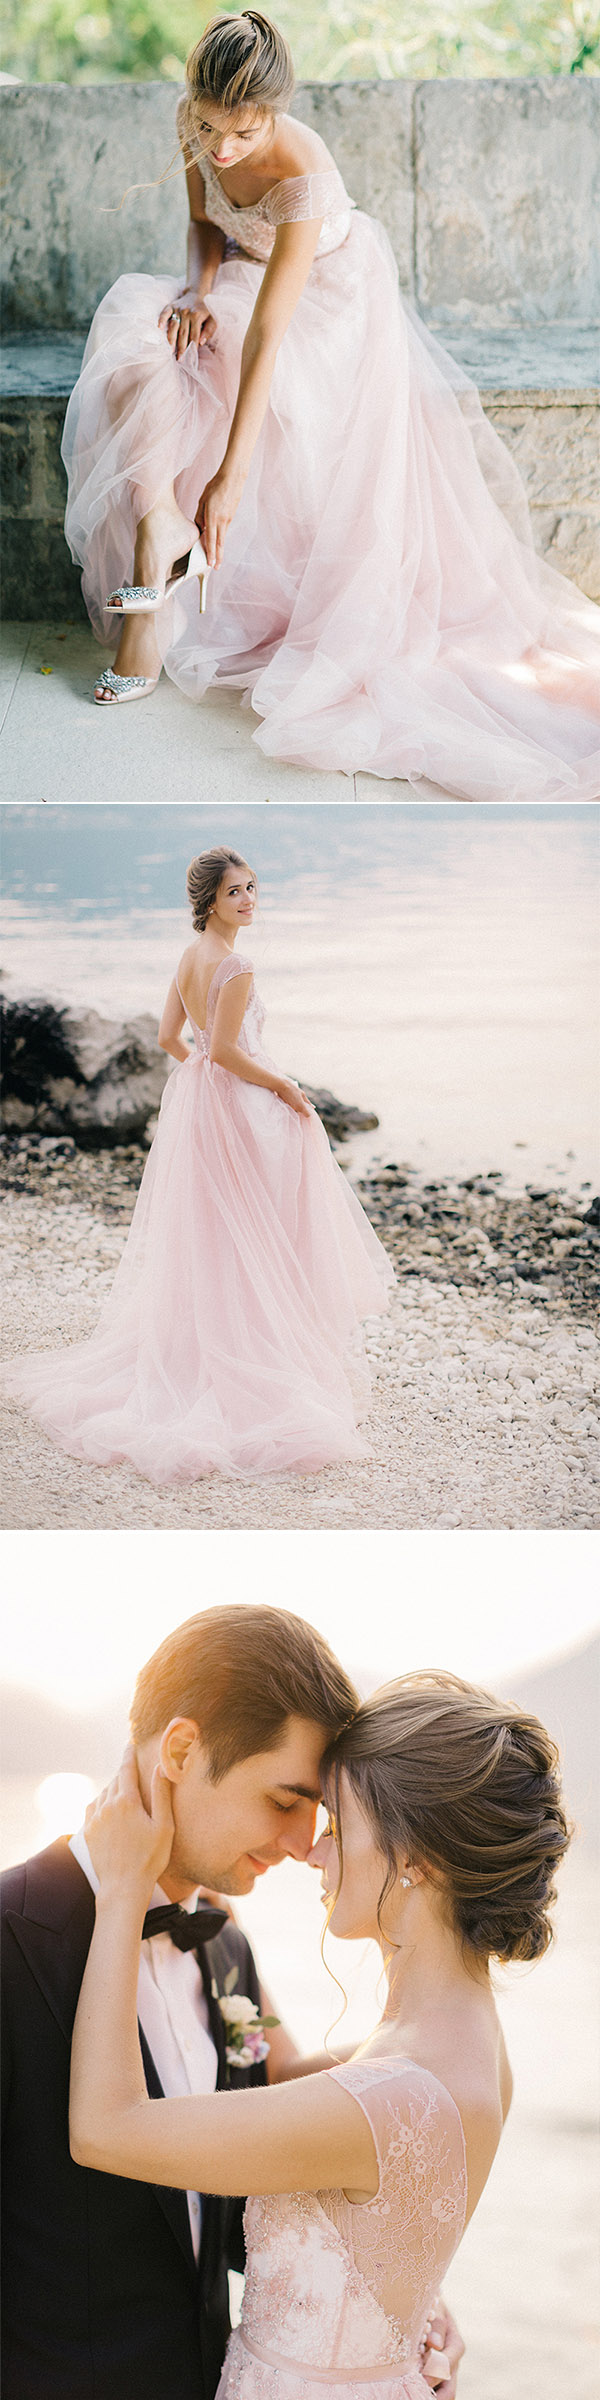 Suknia ślubna na wiosnę, wiosenna suknia ślubna, zwiewna suknia ślubna, panna młoda, ślub na wiosnę, wiosenny ślub